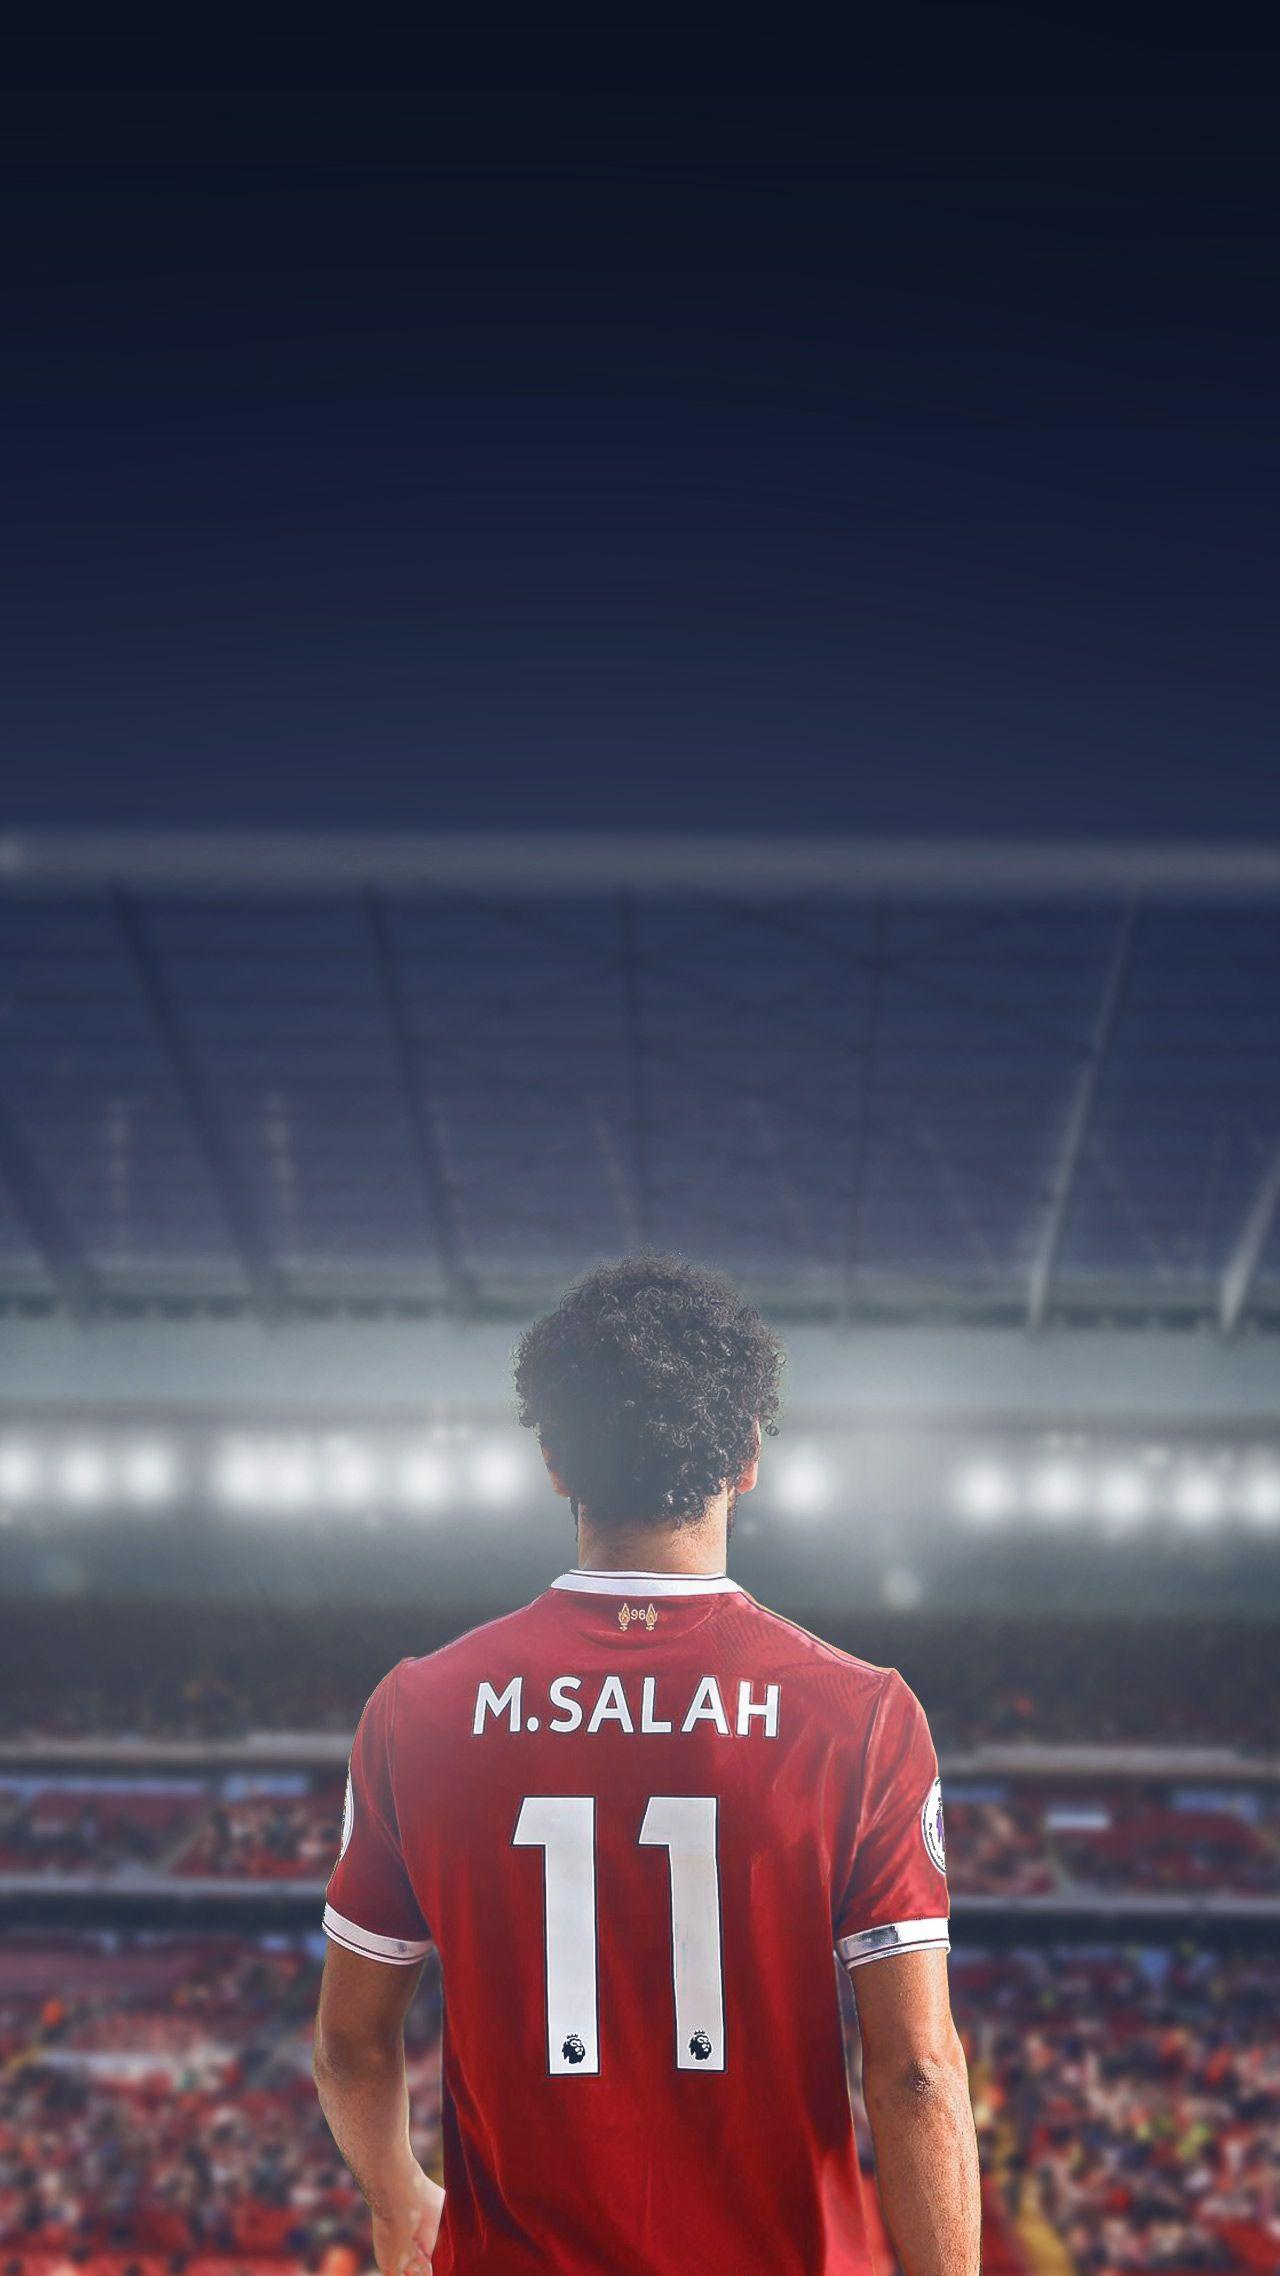 Mohamed Salah Liverpool Wallpapers Wallpaper Cave